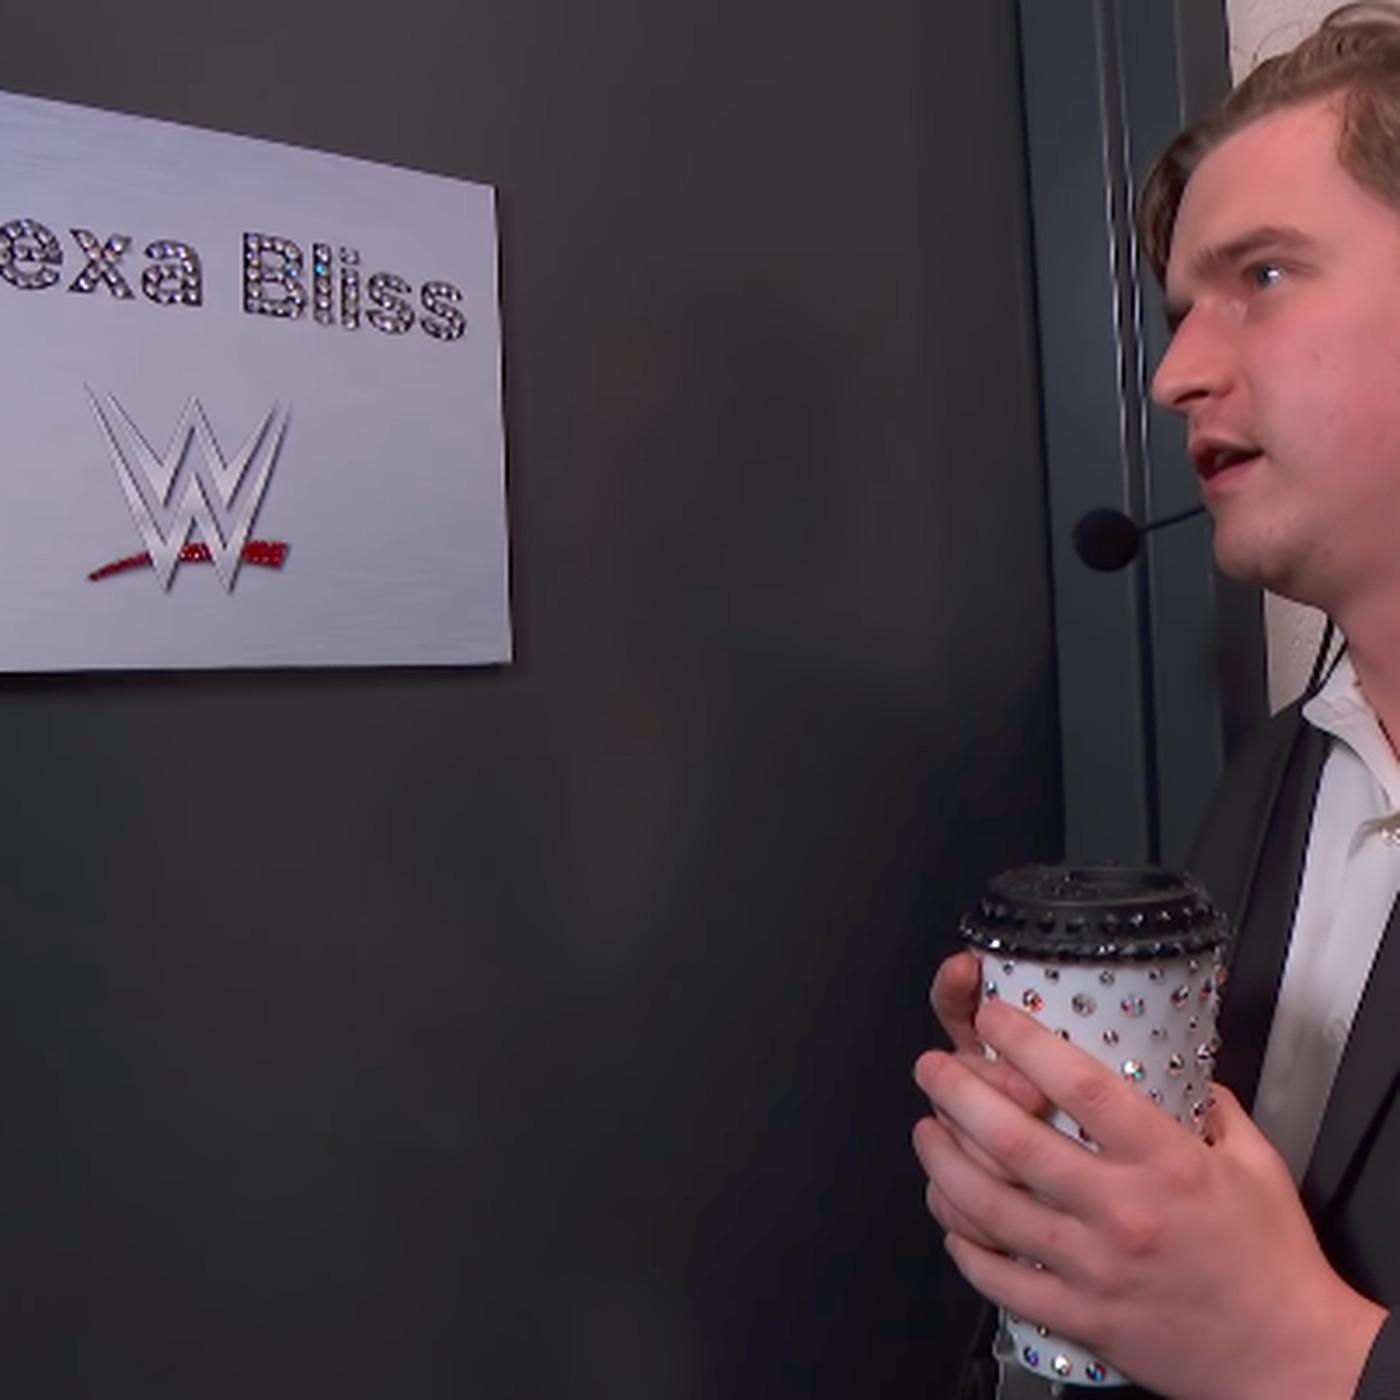 Alexa Blis Porno whatever else it was, raw's alexa bliss dressing room